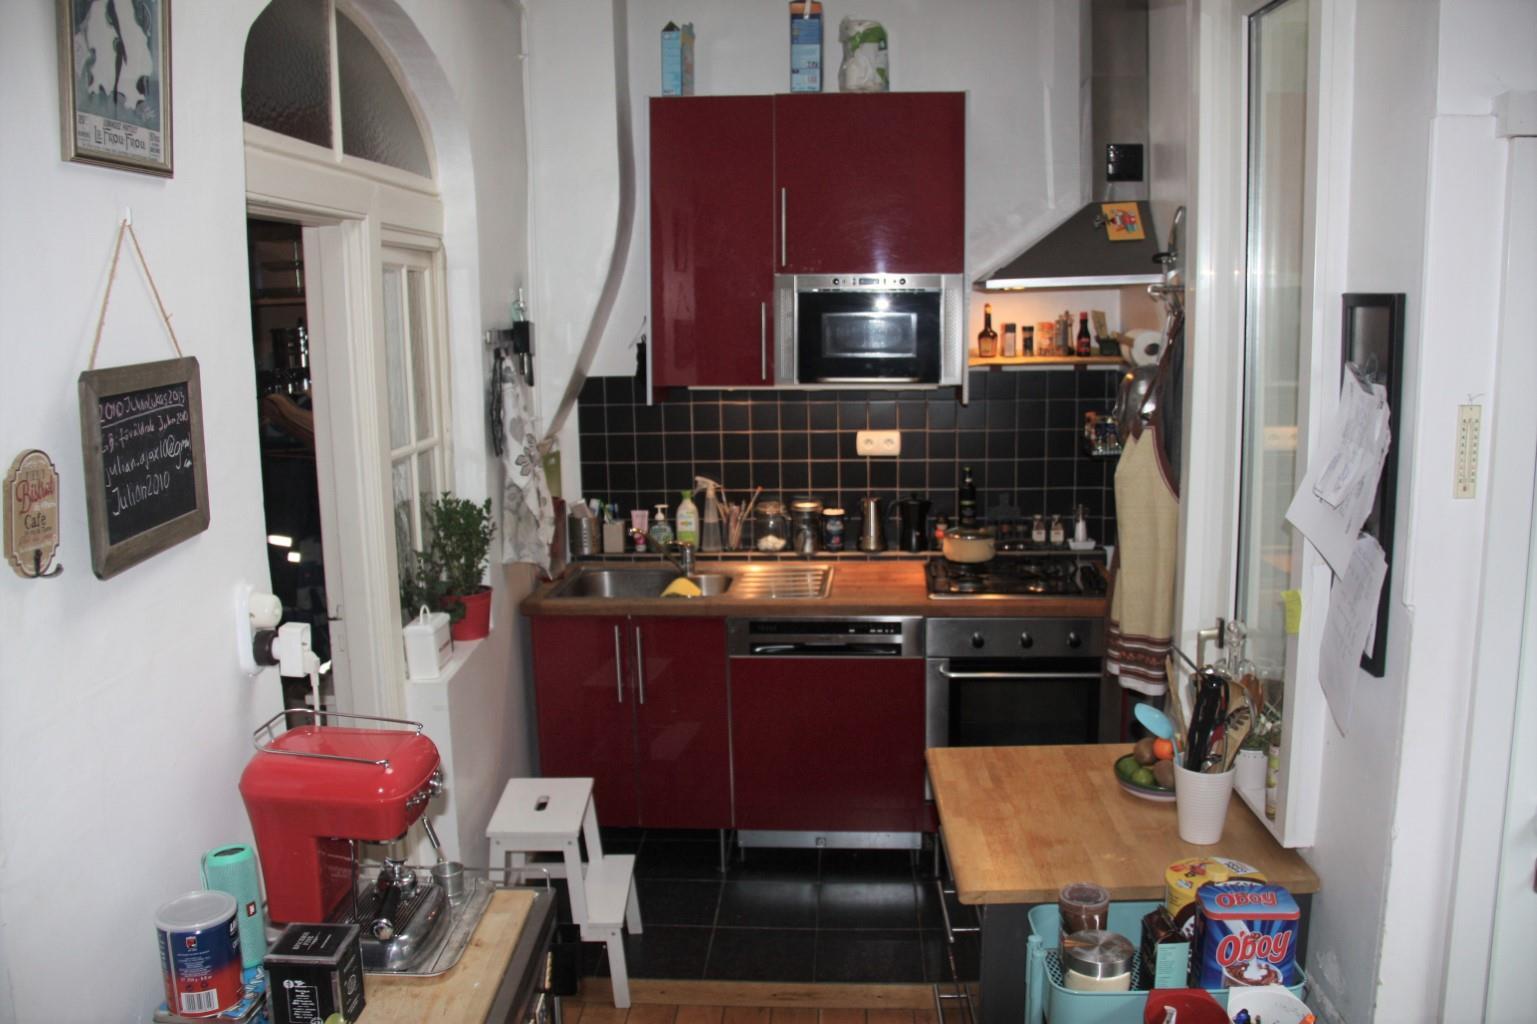 Maison - Auderghem - #4392008-3